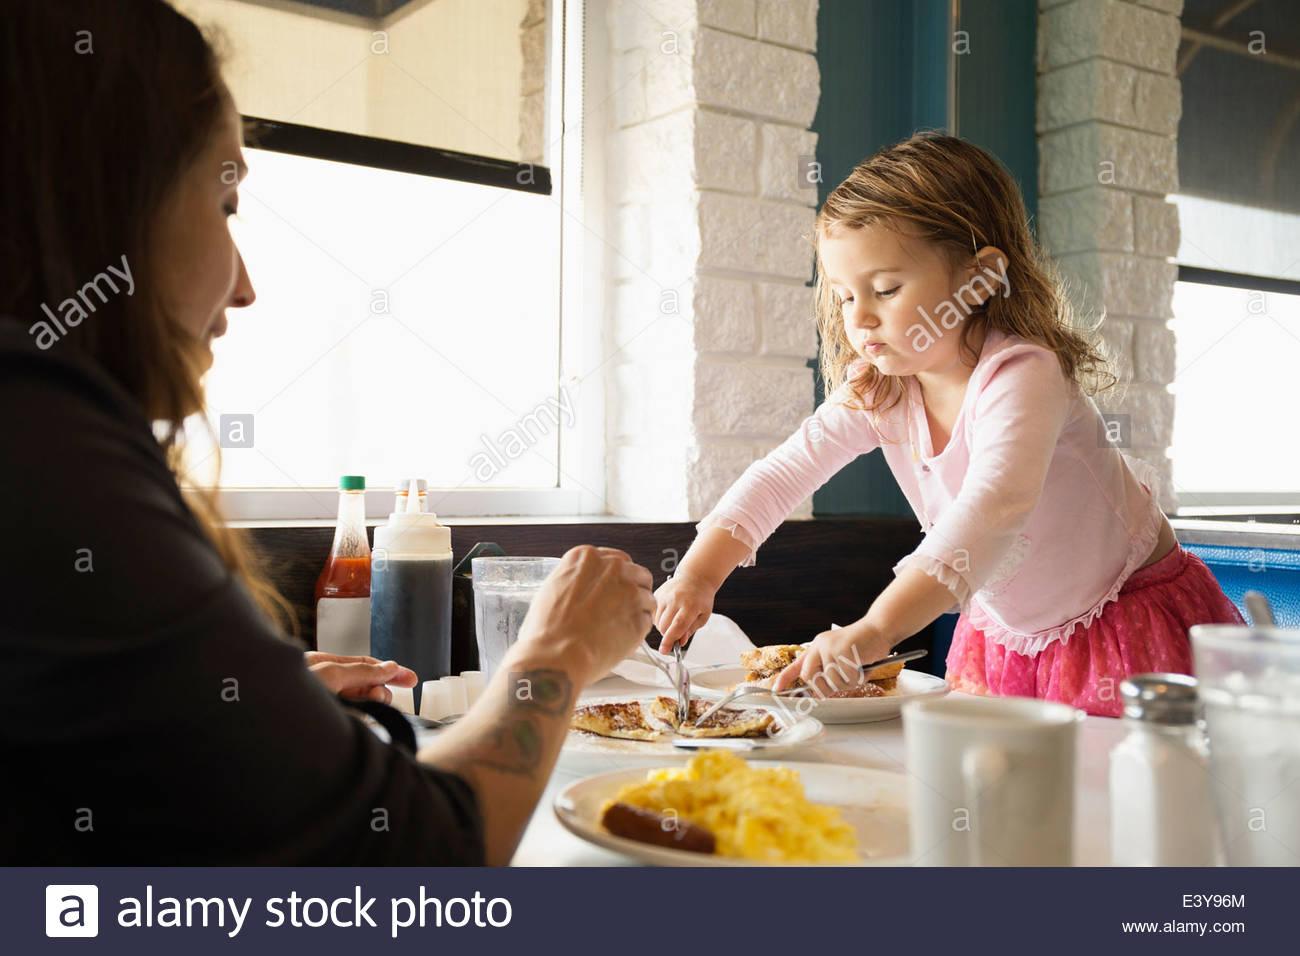 Mère et enfant fille manger en salle à manger Photo Stock